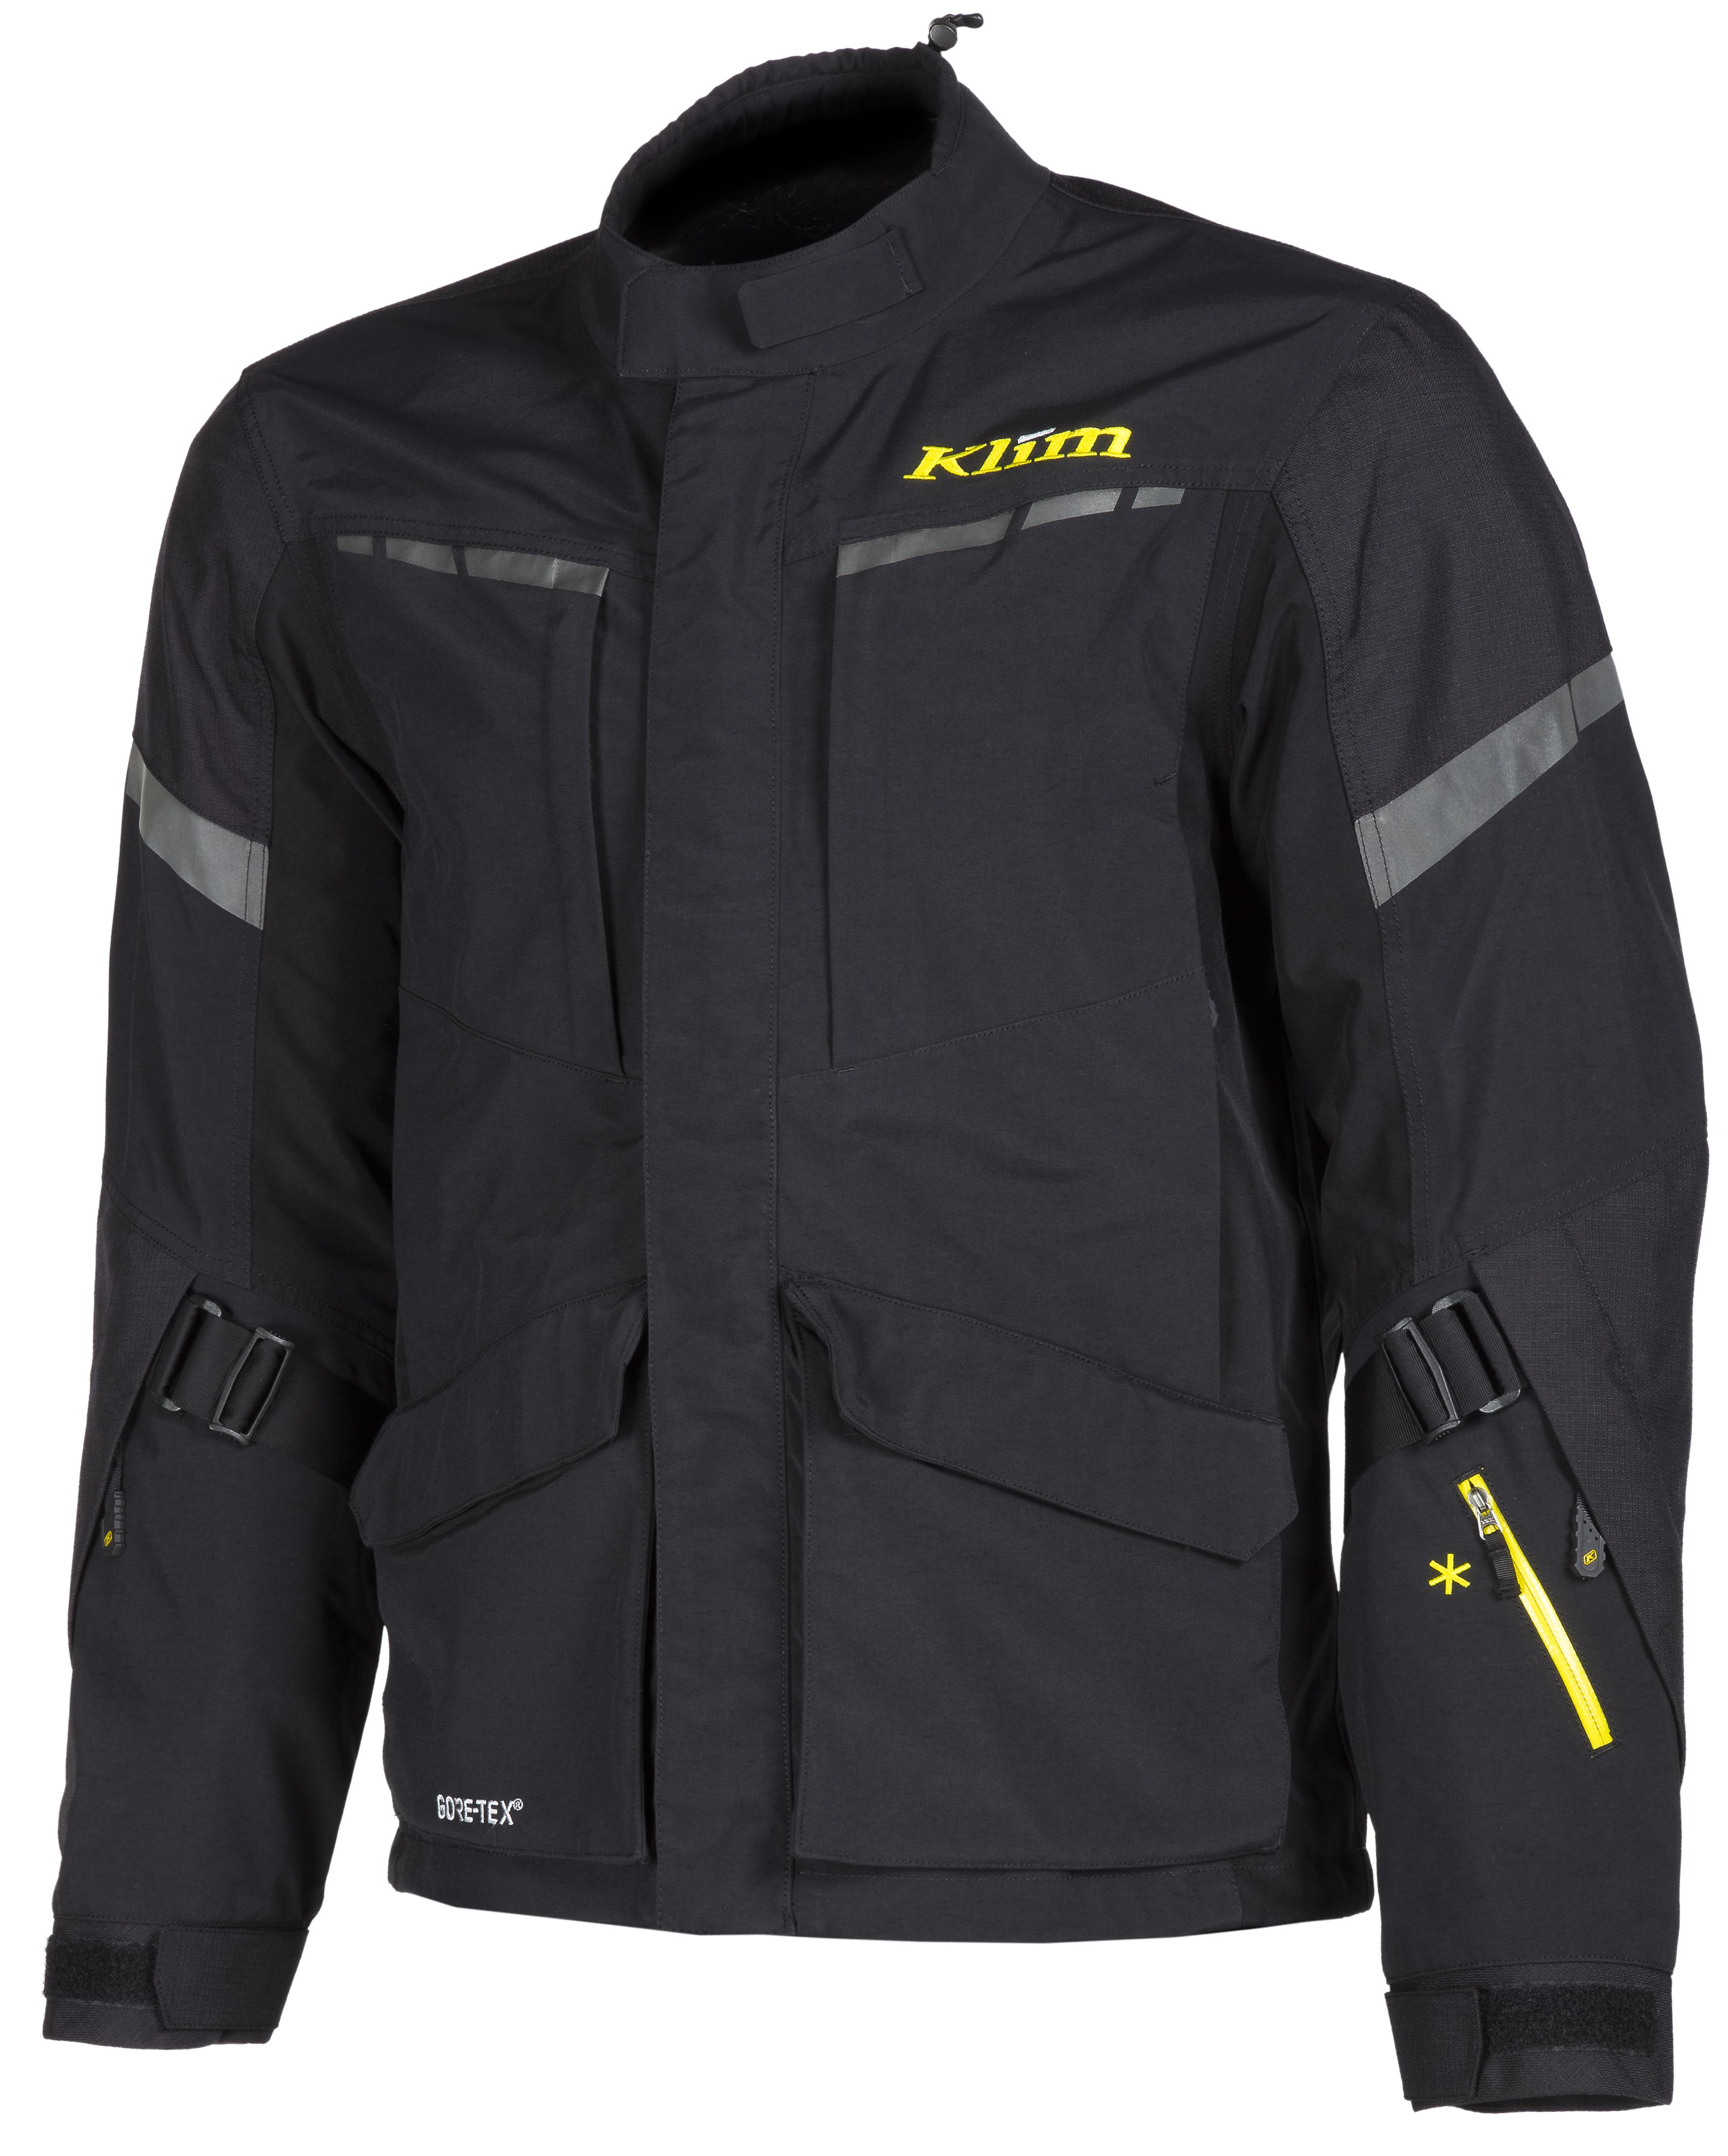 6029-001-000 Carlsbad Jacket